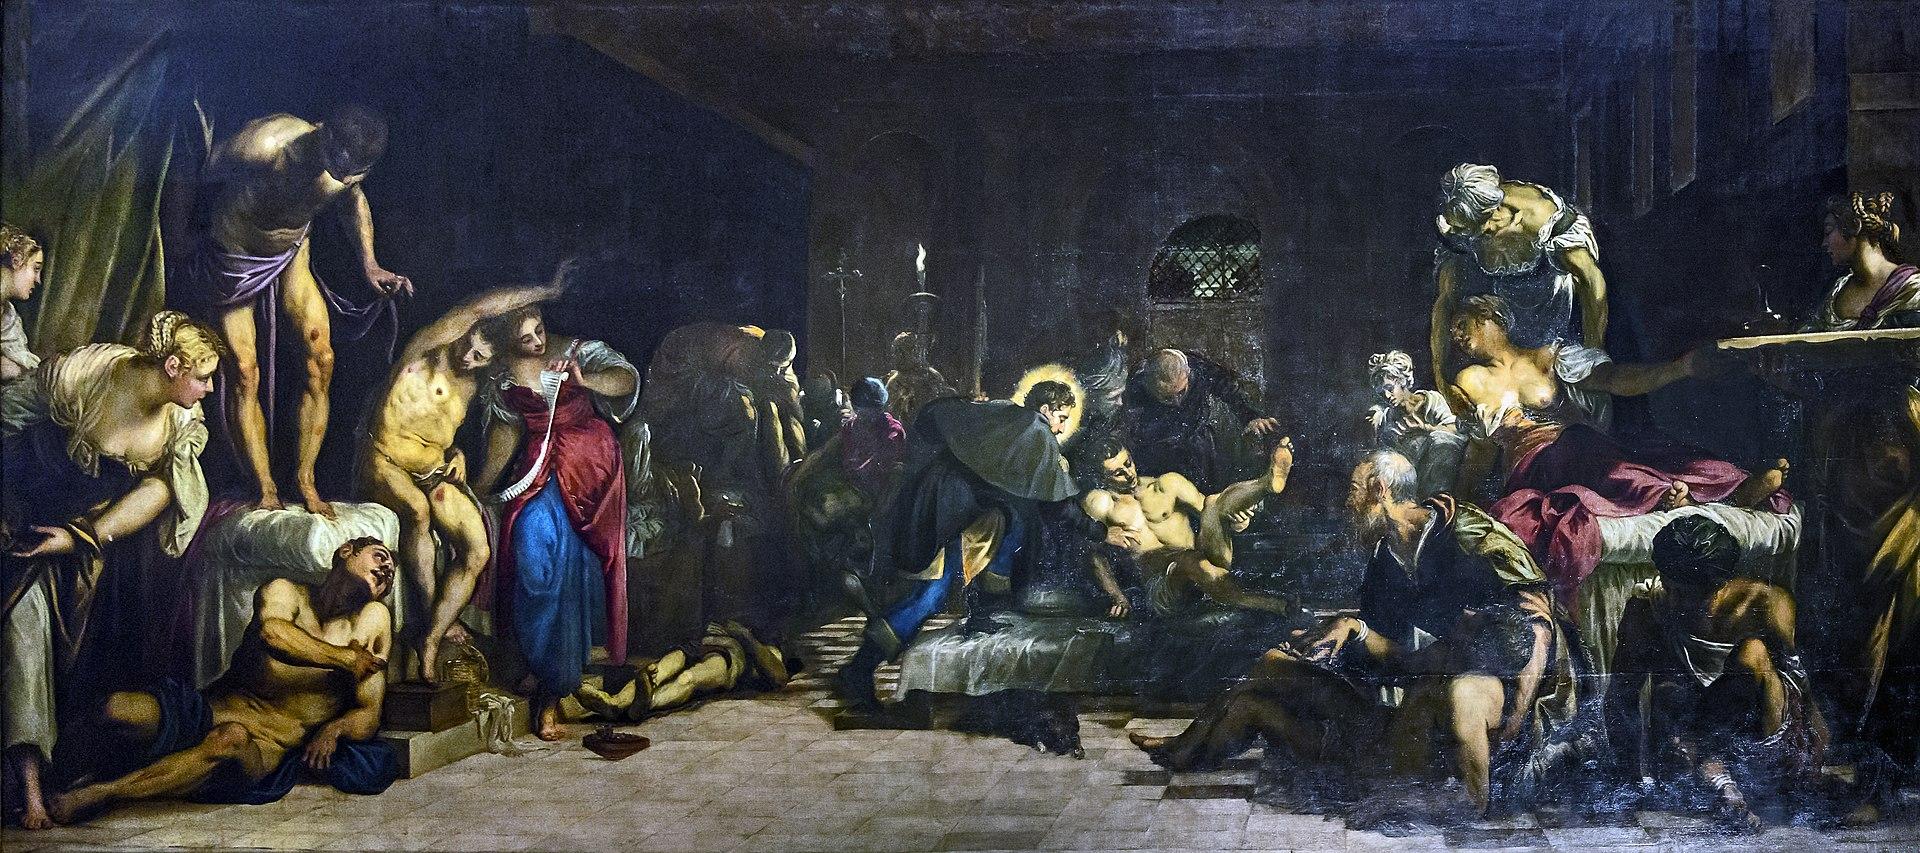 San Rocco Venezia (Interno) - San Rocco risana gli appestati.jpg